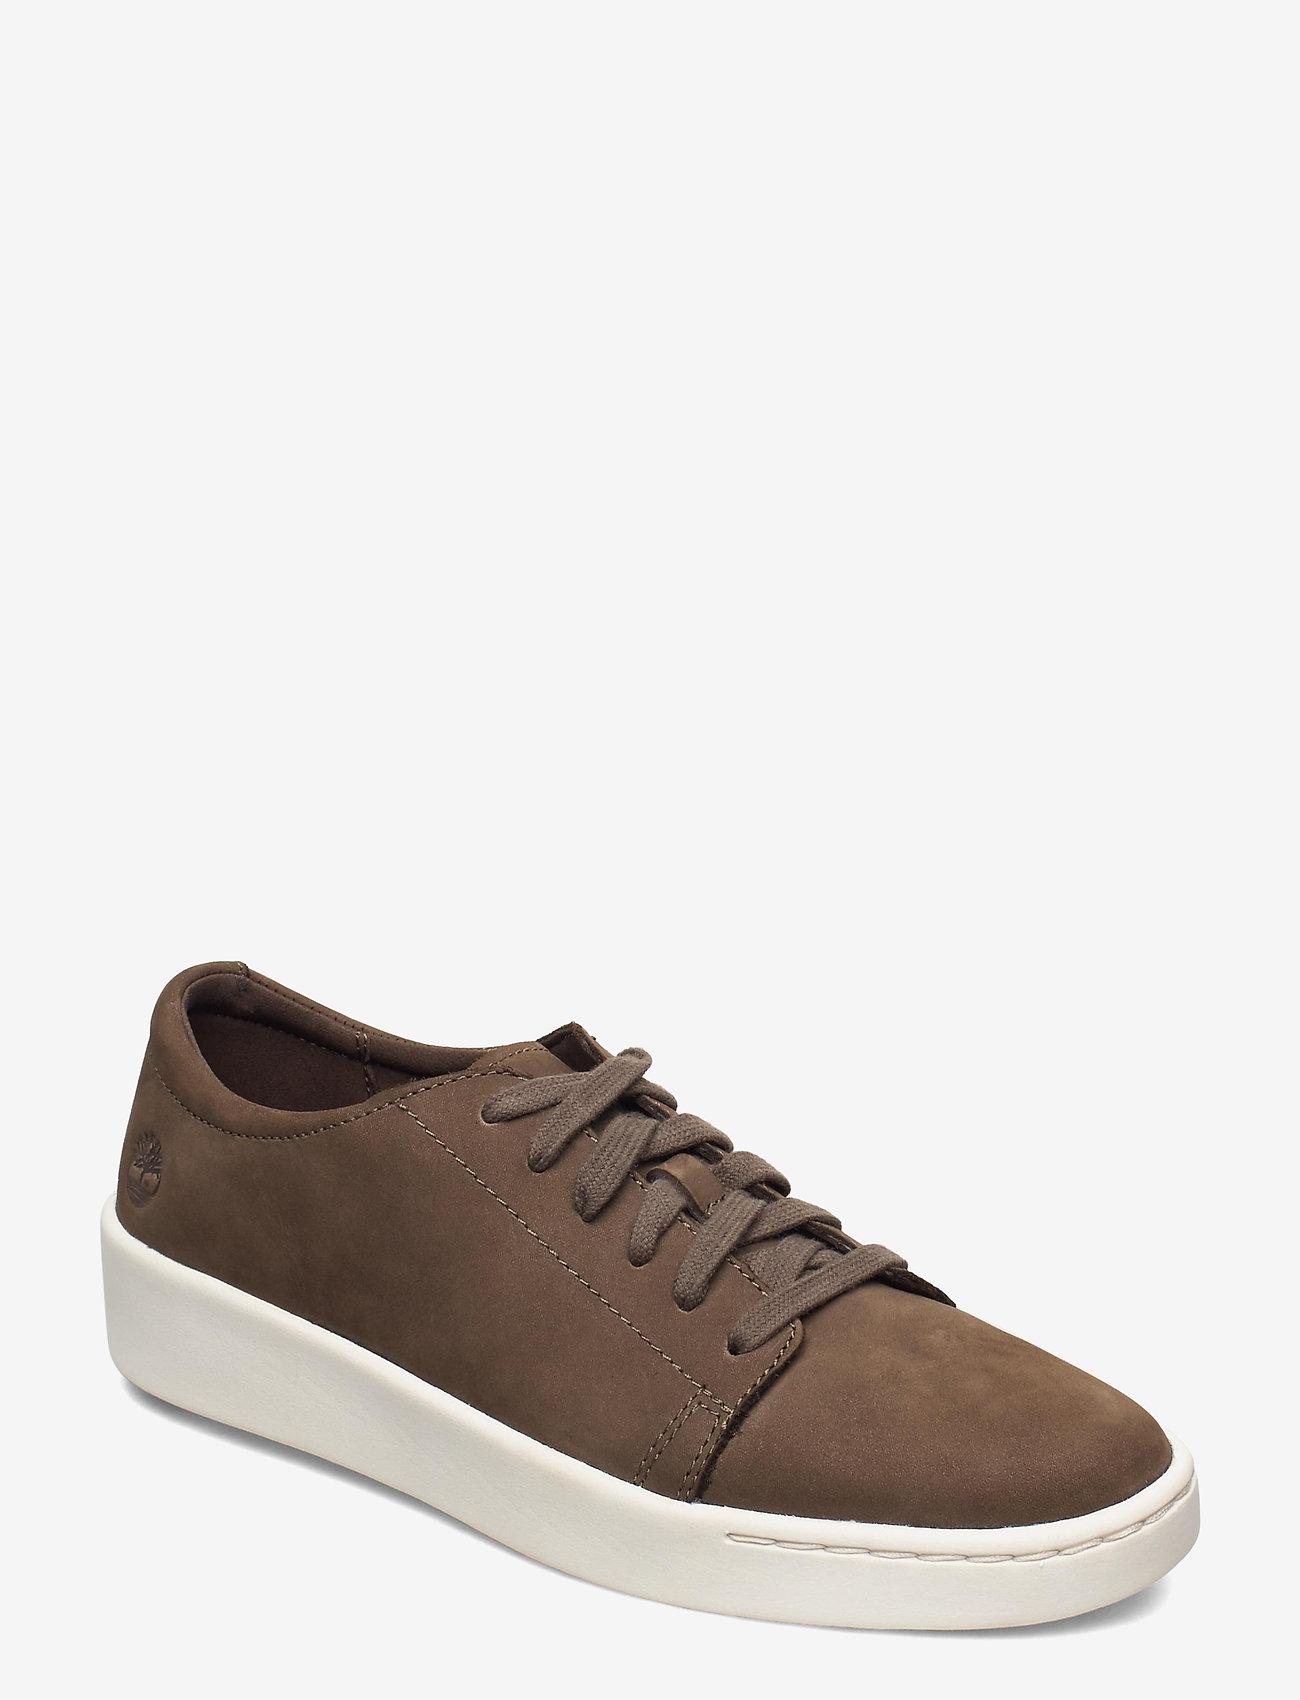 Timberland - TEYA OX OLV - lage sneakers - canteen - 0